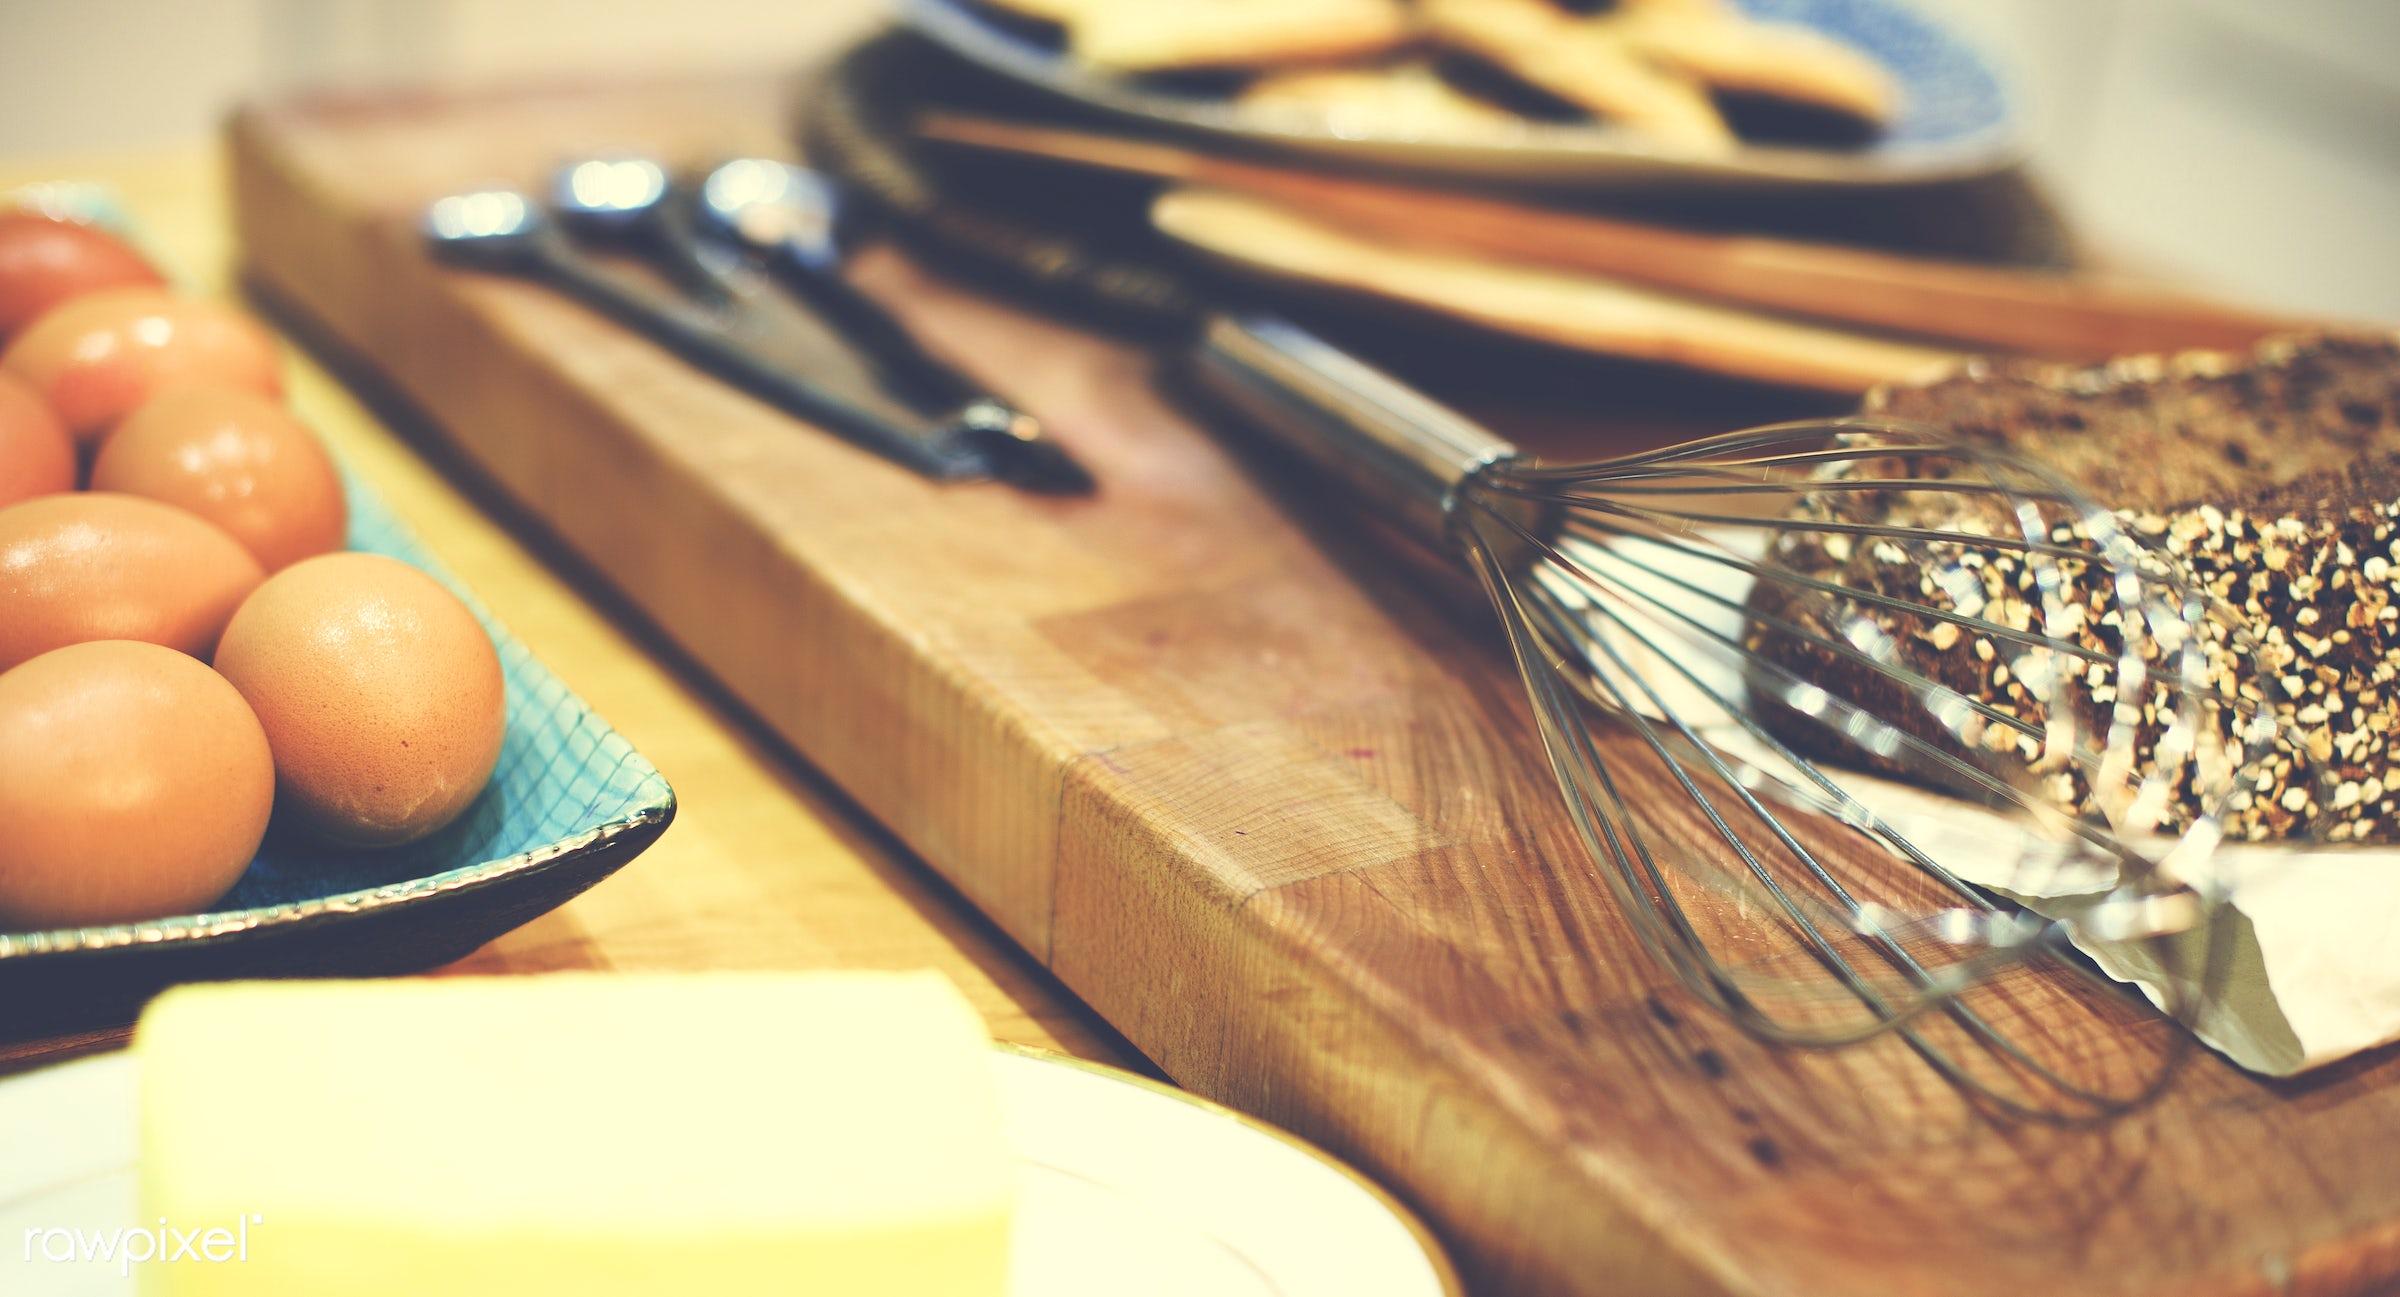 bake, bake shop, bakery, baking, chocolate chip cookies, cook, cookies, cooking, cutlery, delicious, diet, eggs, equipment,...